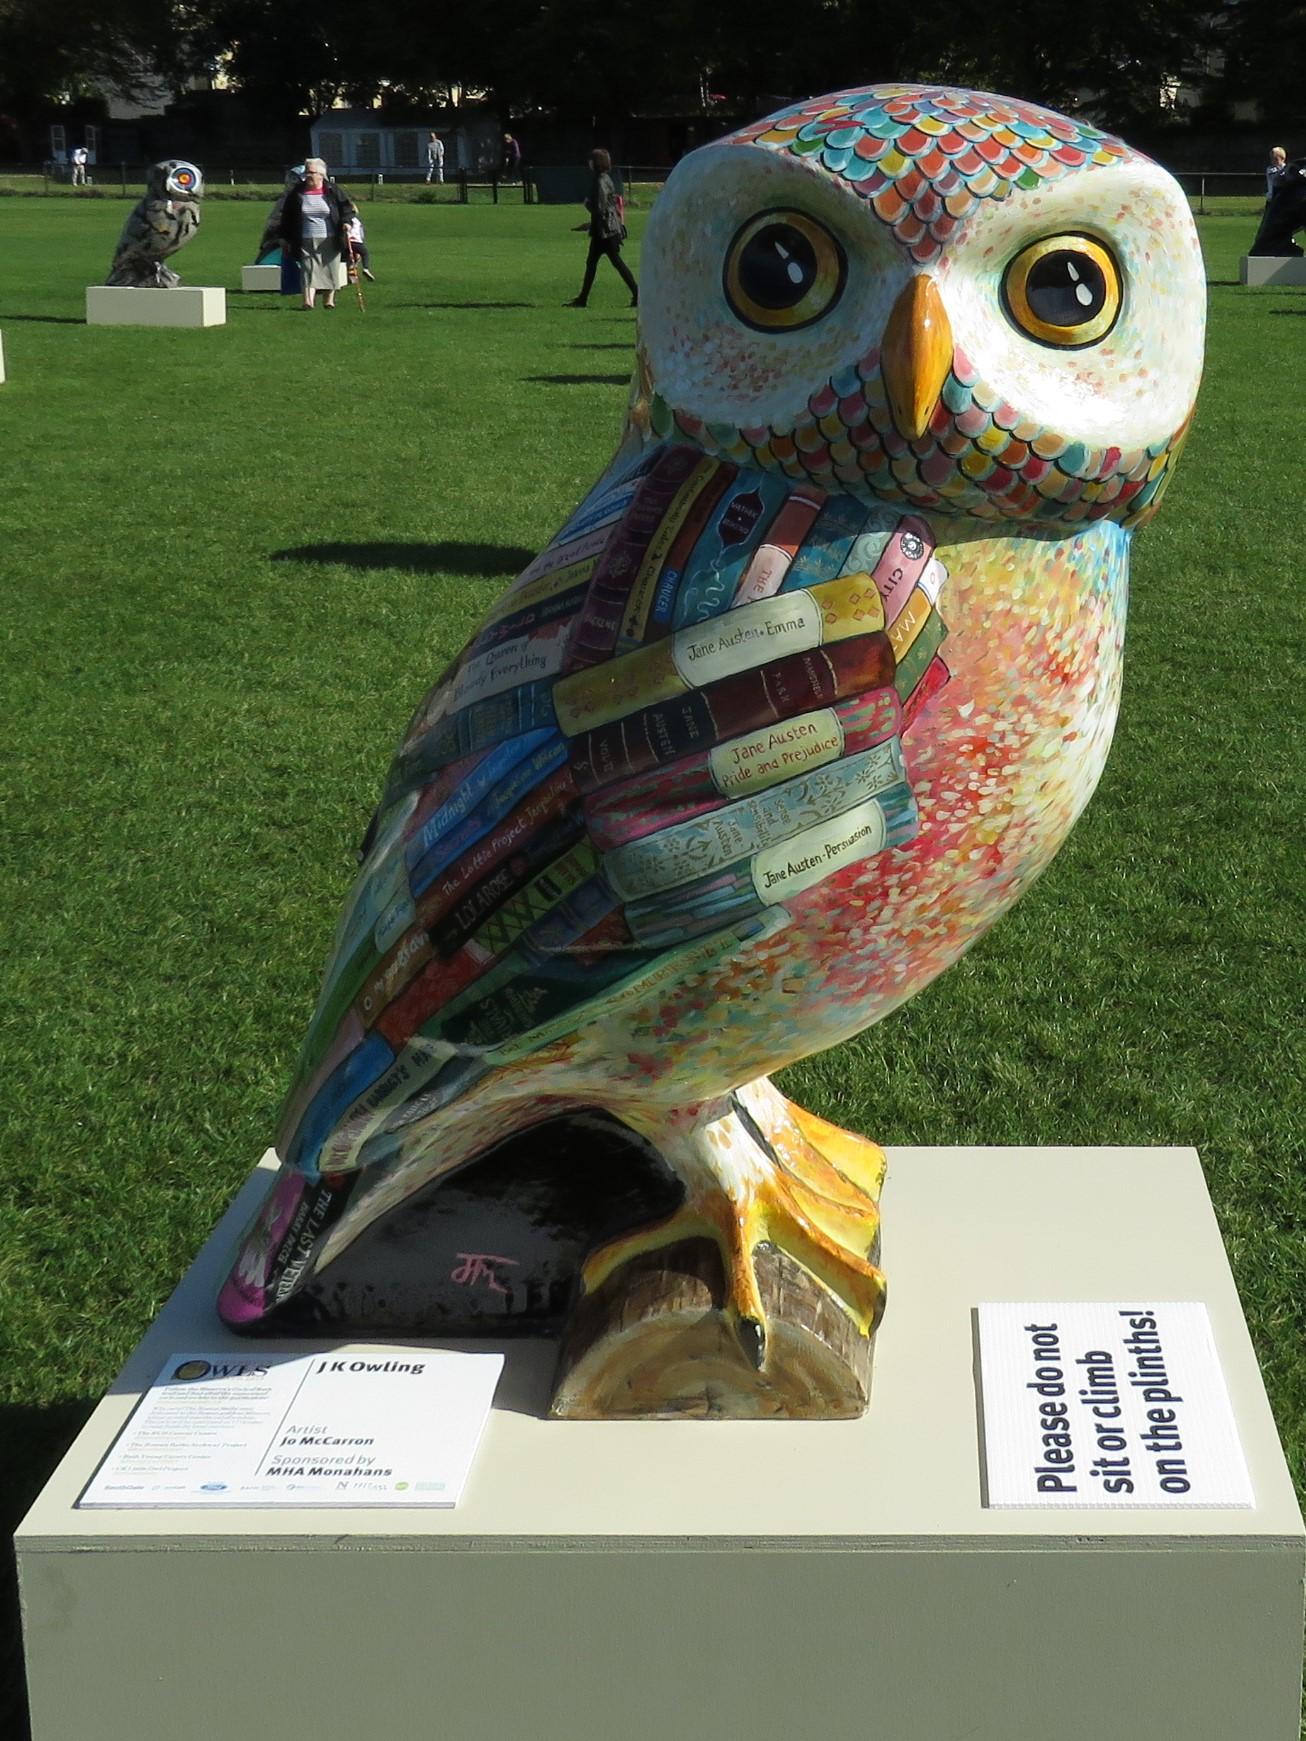 JK Owling, Minerva's Owls Art Trail, Bath, England